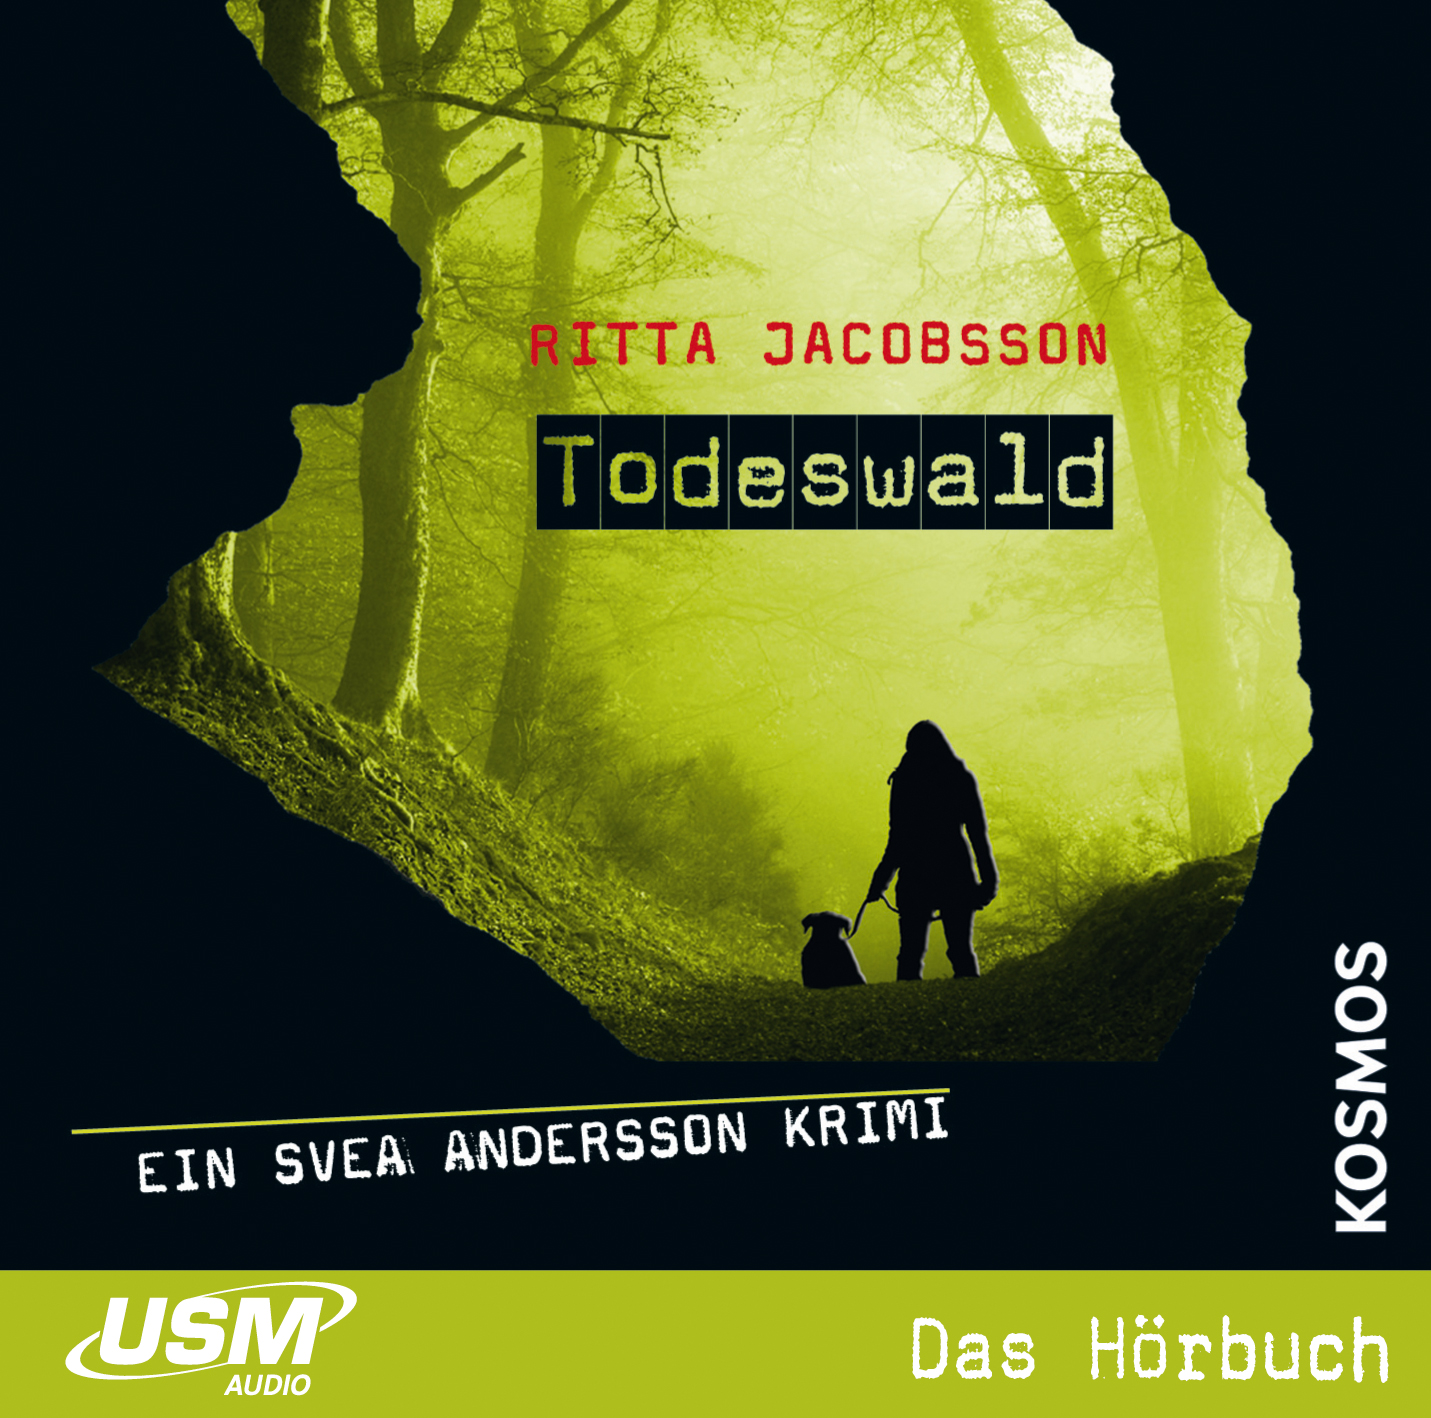 Svea Andersson